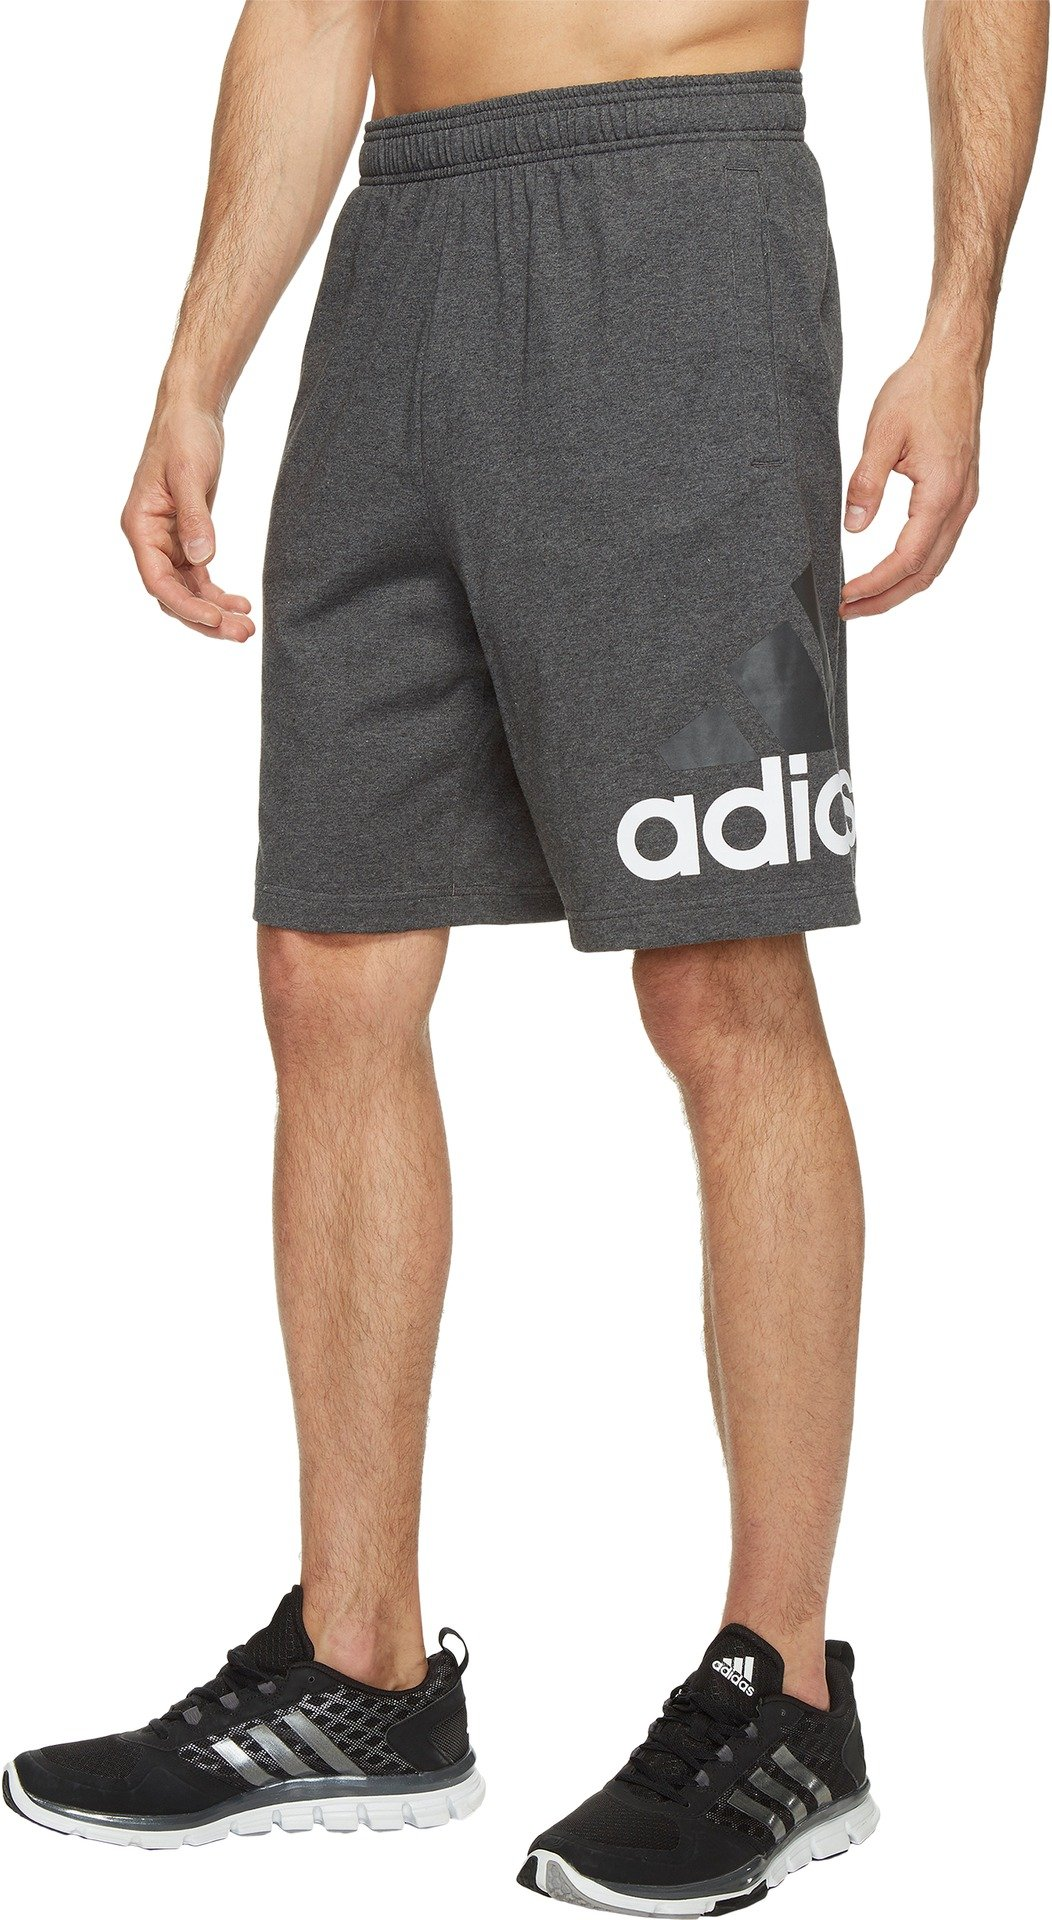 adidas Men's Athletics Jersey Shorts, Dark Grey Heather, Medium by adidas